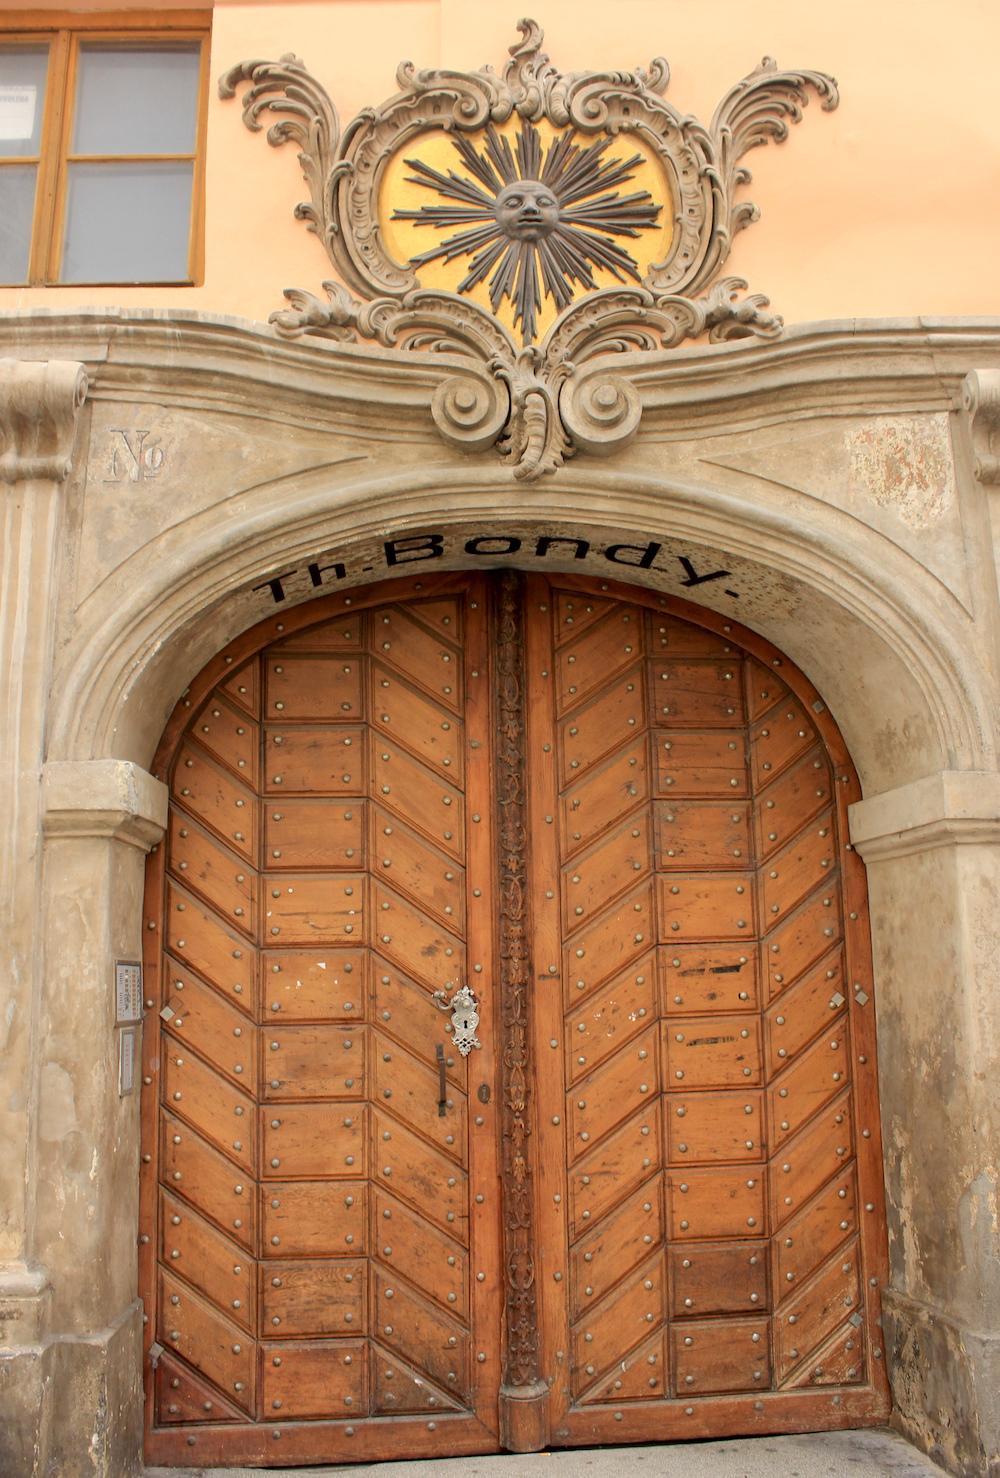 House sign on Celetná Street in Prague | Photo credit: Rose Spaziani